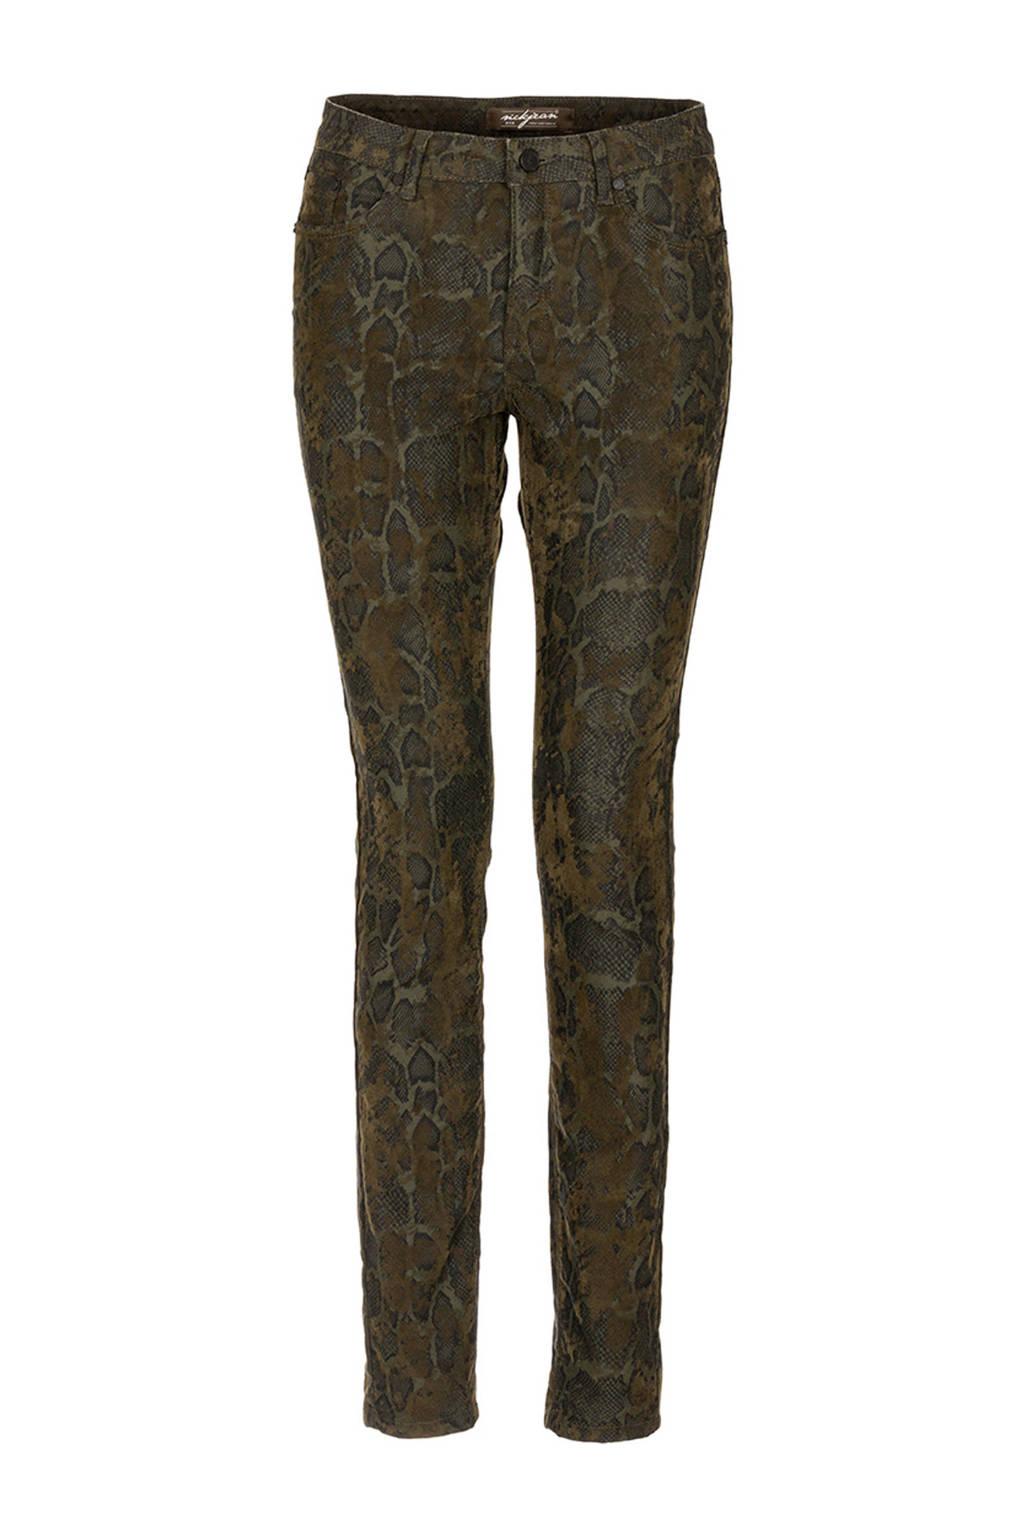 NickJean slim fit broek met slangenprint kaki, Kaki